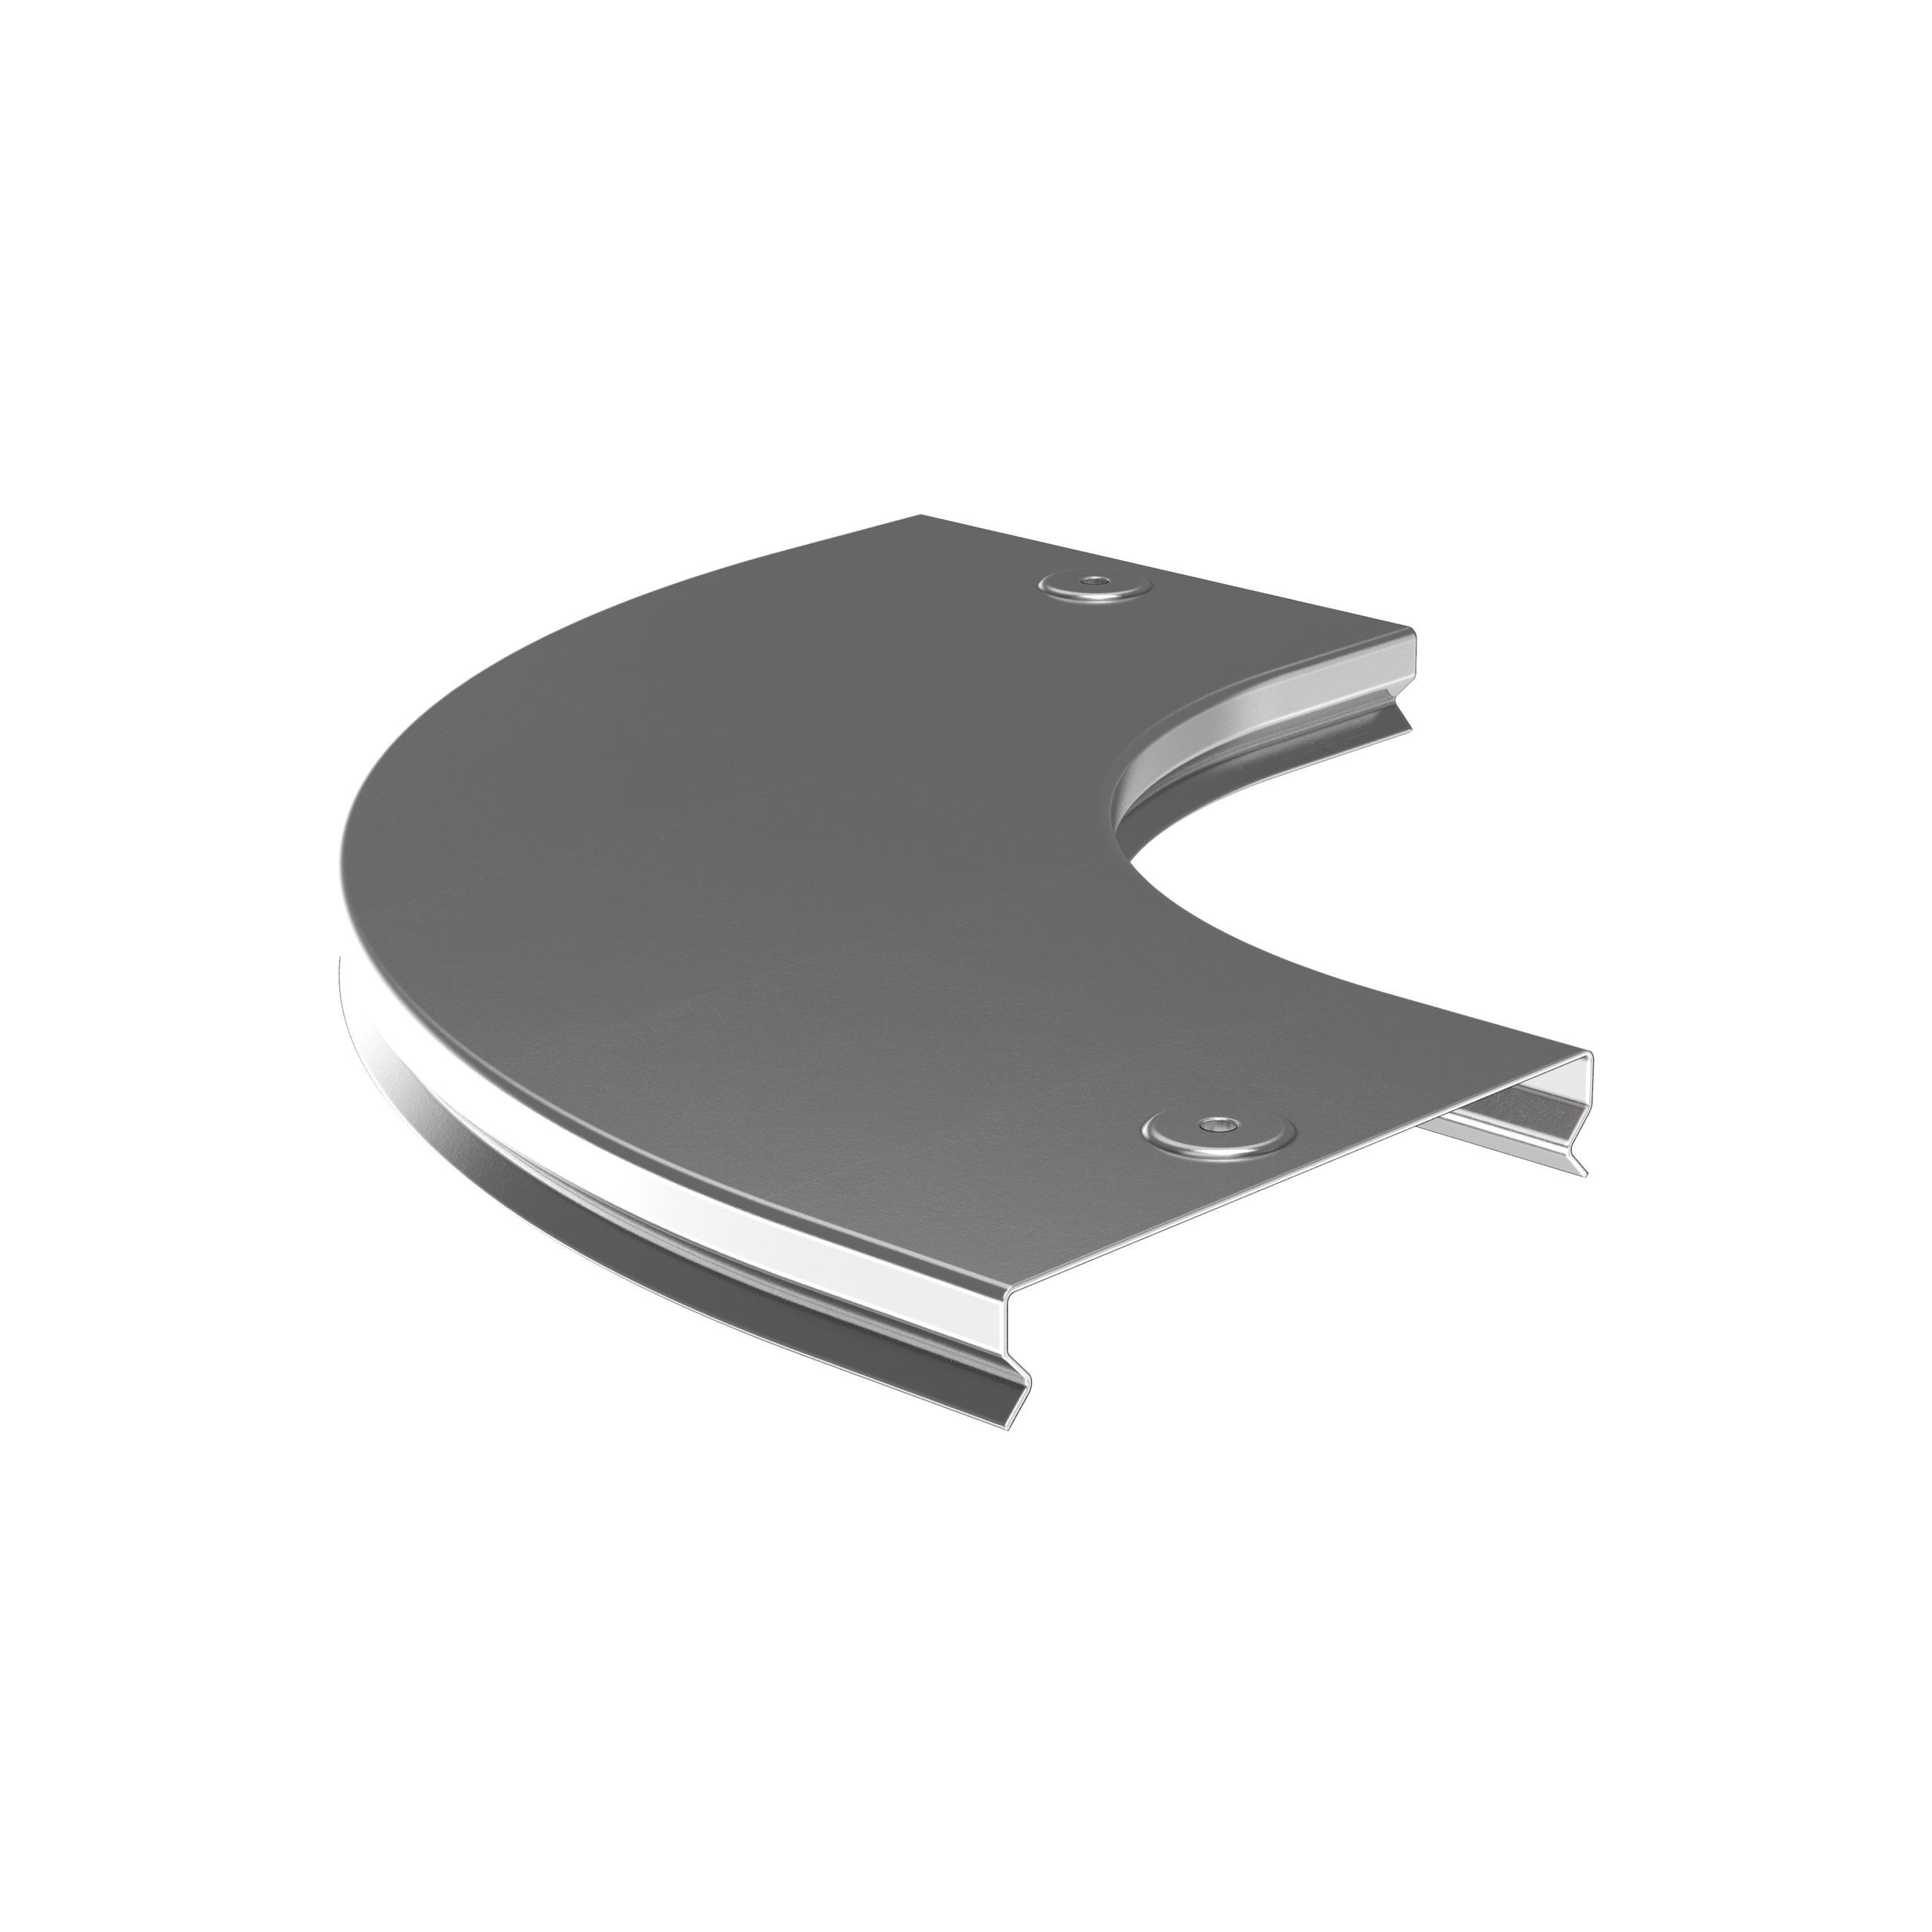 Крышка поворота плавного 90град (тип Г01) ESCA 50мм IEK